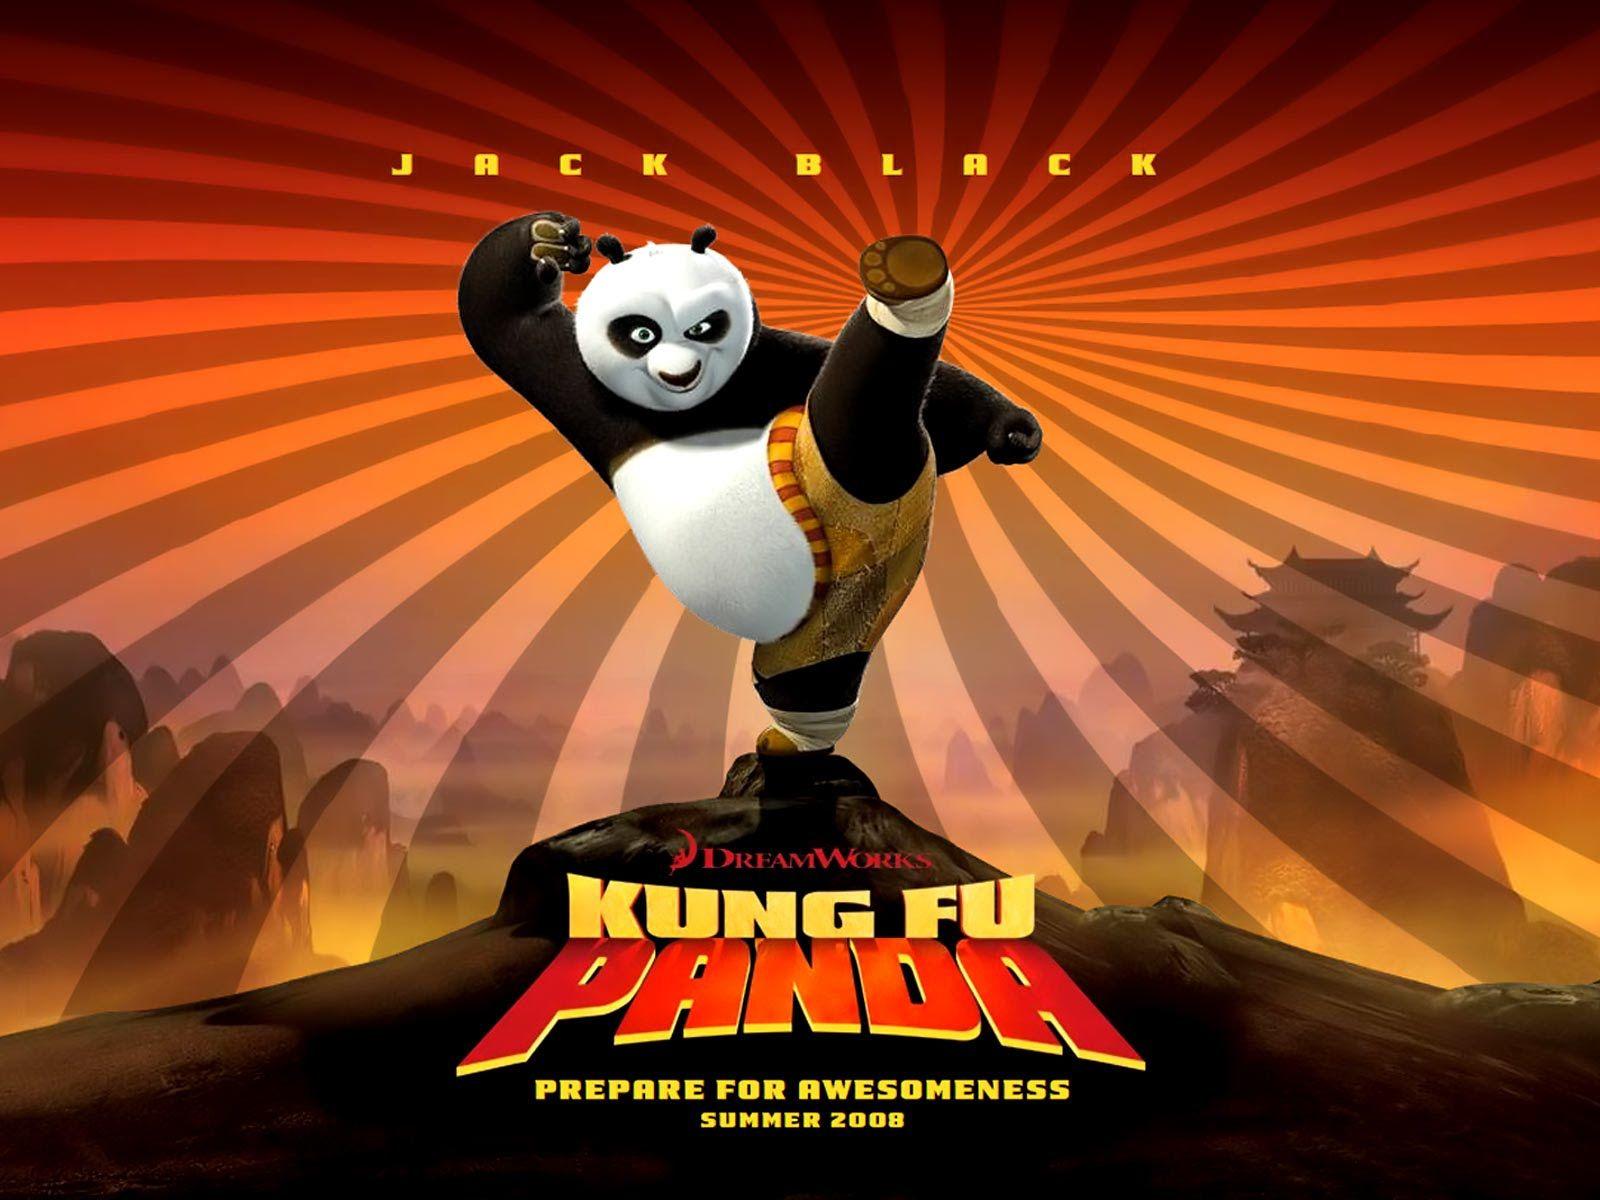 Free Full Cartoon Movies animation movies-cartoon for children-kids movies-kungfu panda 2